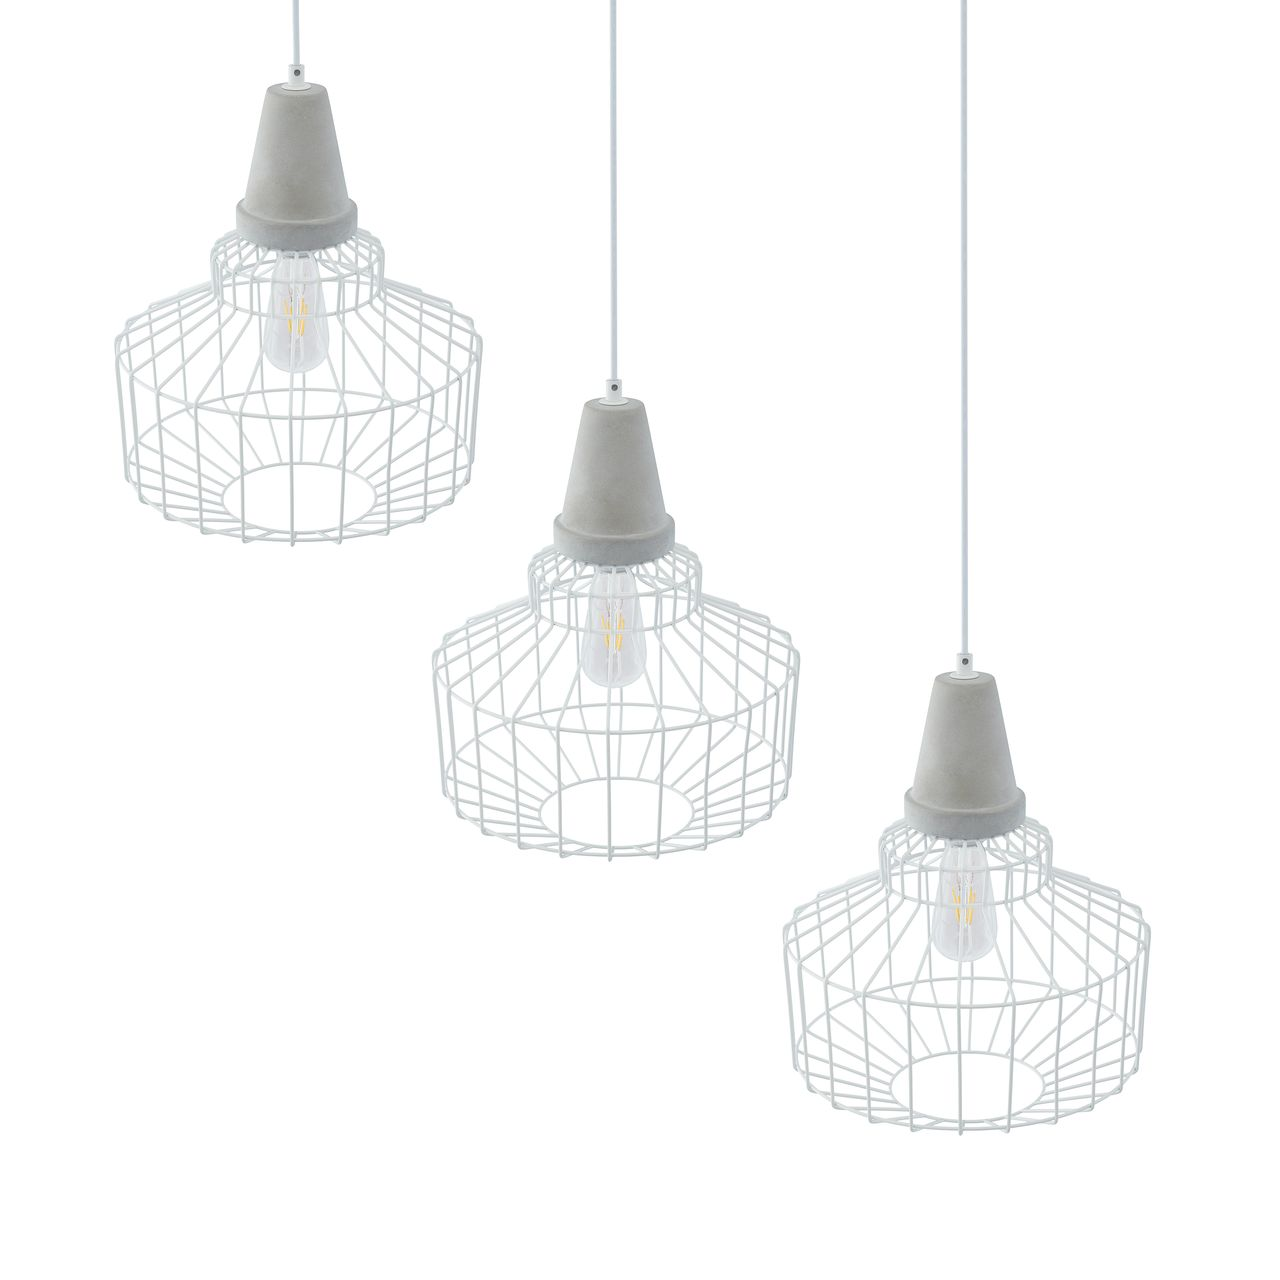 SEI Brantville Cage Pendant Lamp in White / Cement Gray - Set of 3